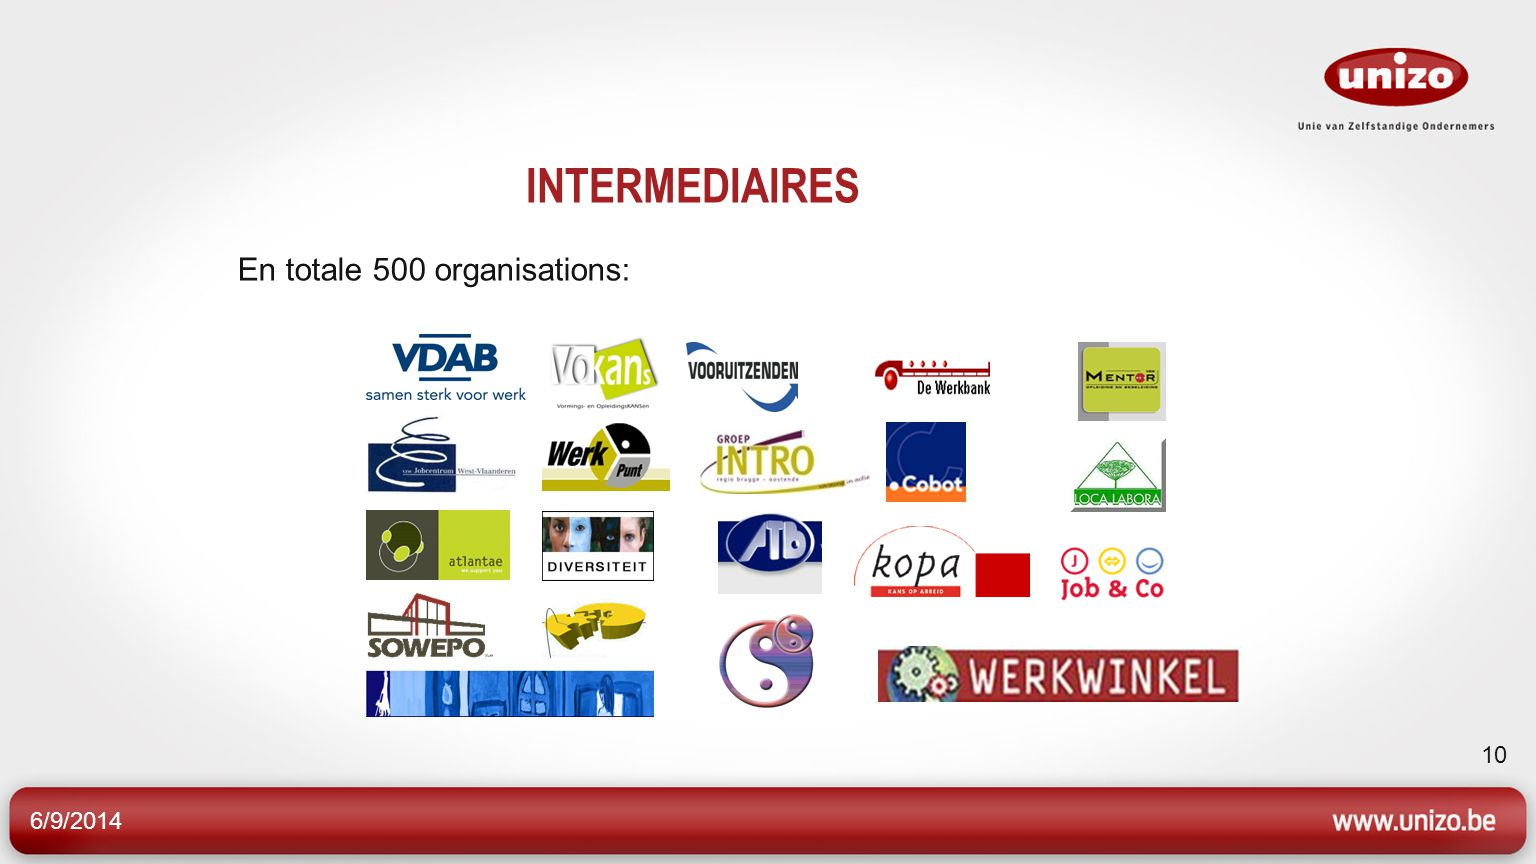 6/9/2014 10 INTERMEDIAIRES En totale 500 organisations: